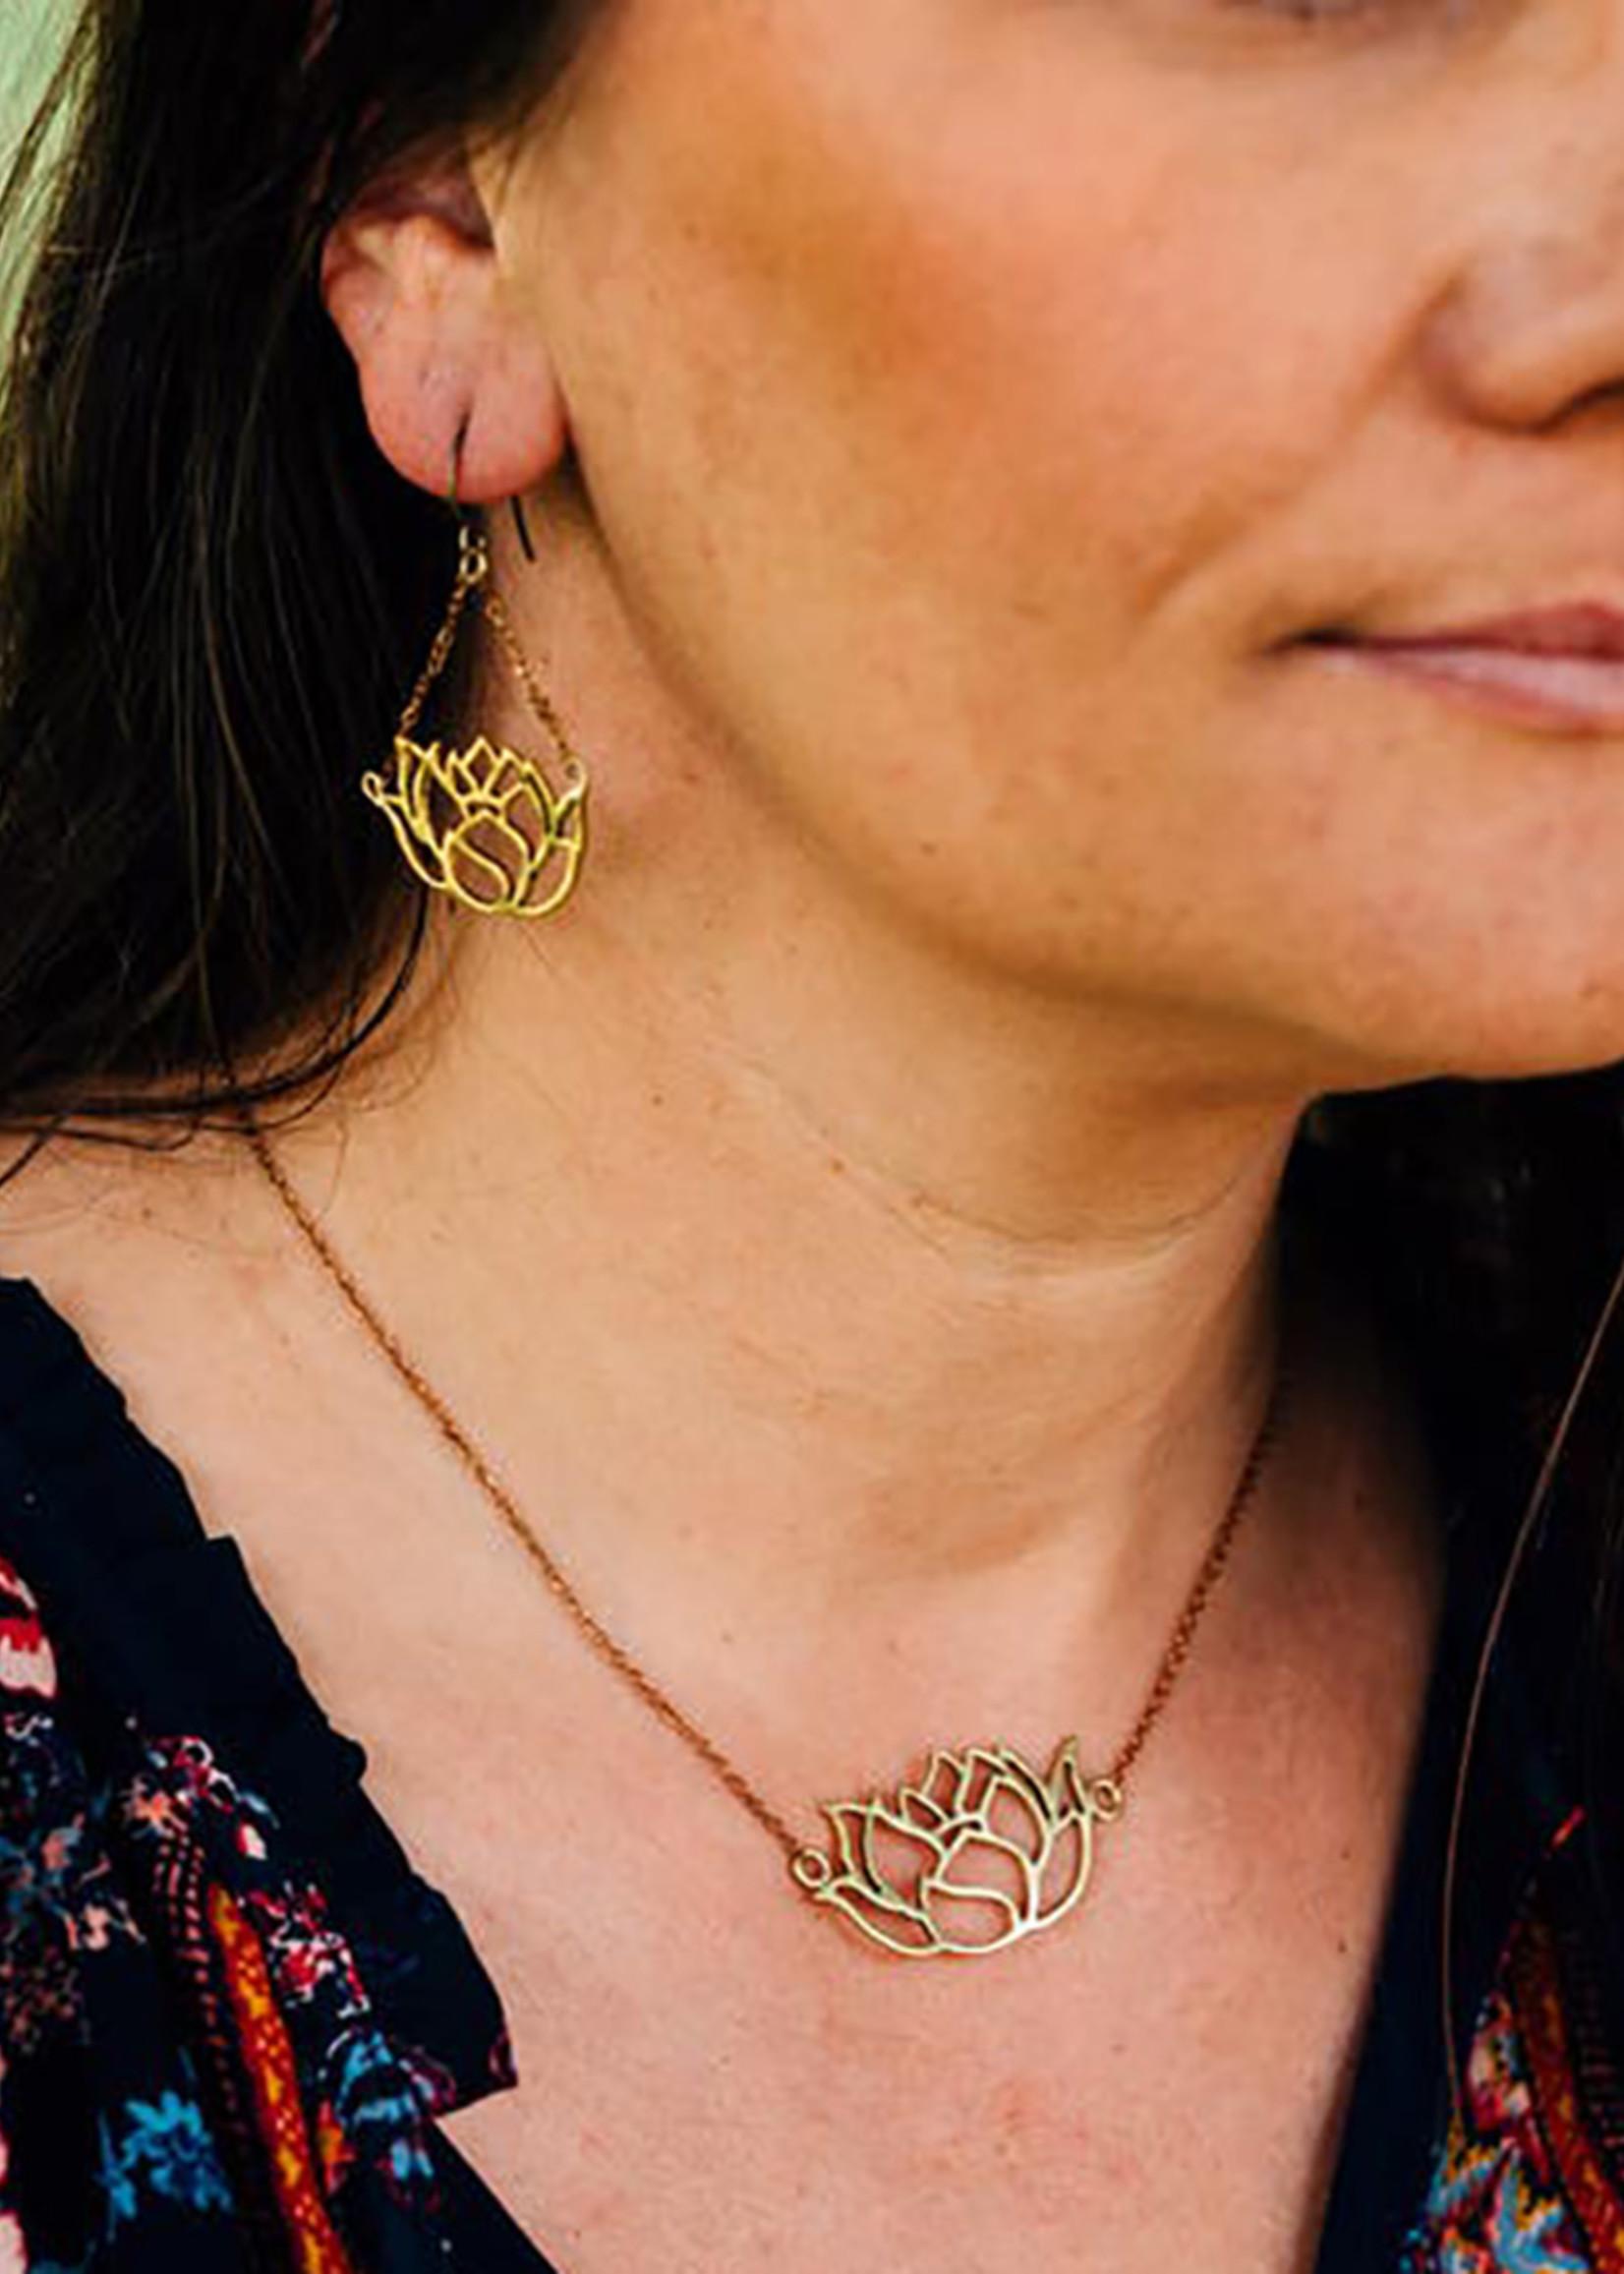 Rajana Graceful Lotus Necklace